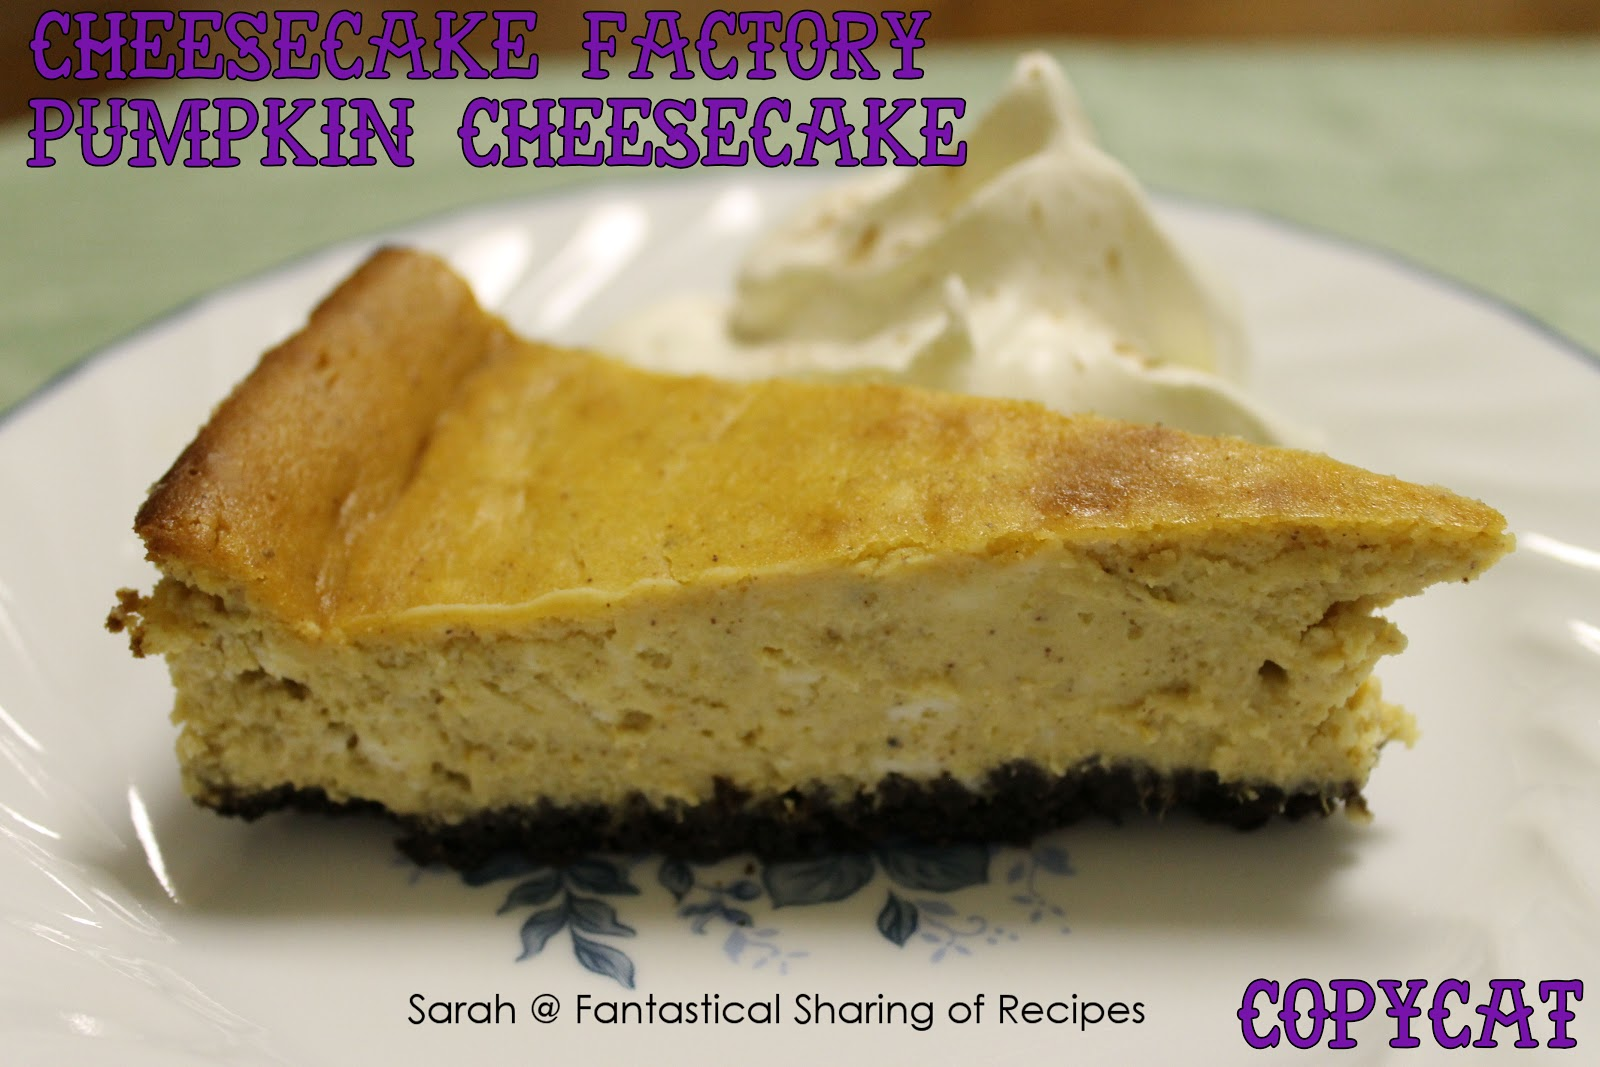 Fantastical Sharing Of Recipes Tasty Thursday 81 Pumpkin Week Cheesecake Factory Pumpkin Cheesecake